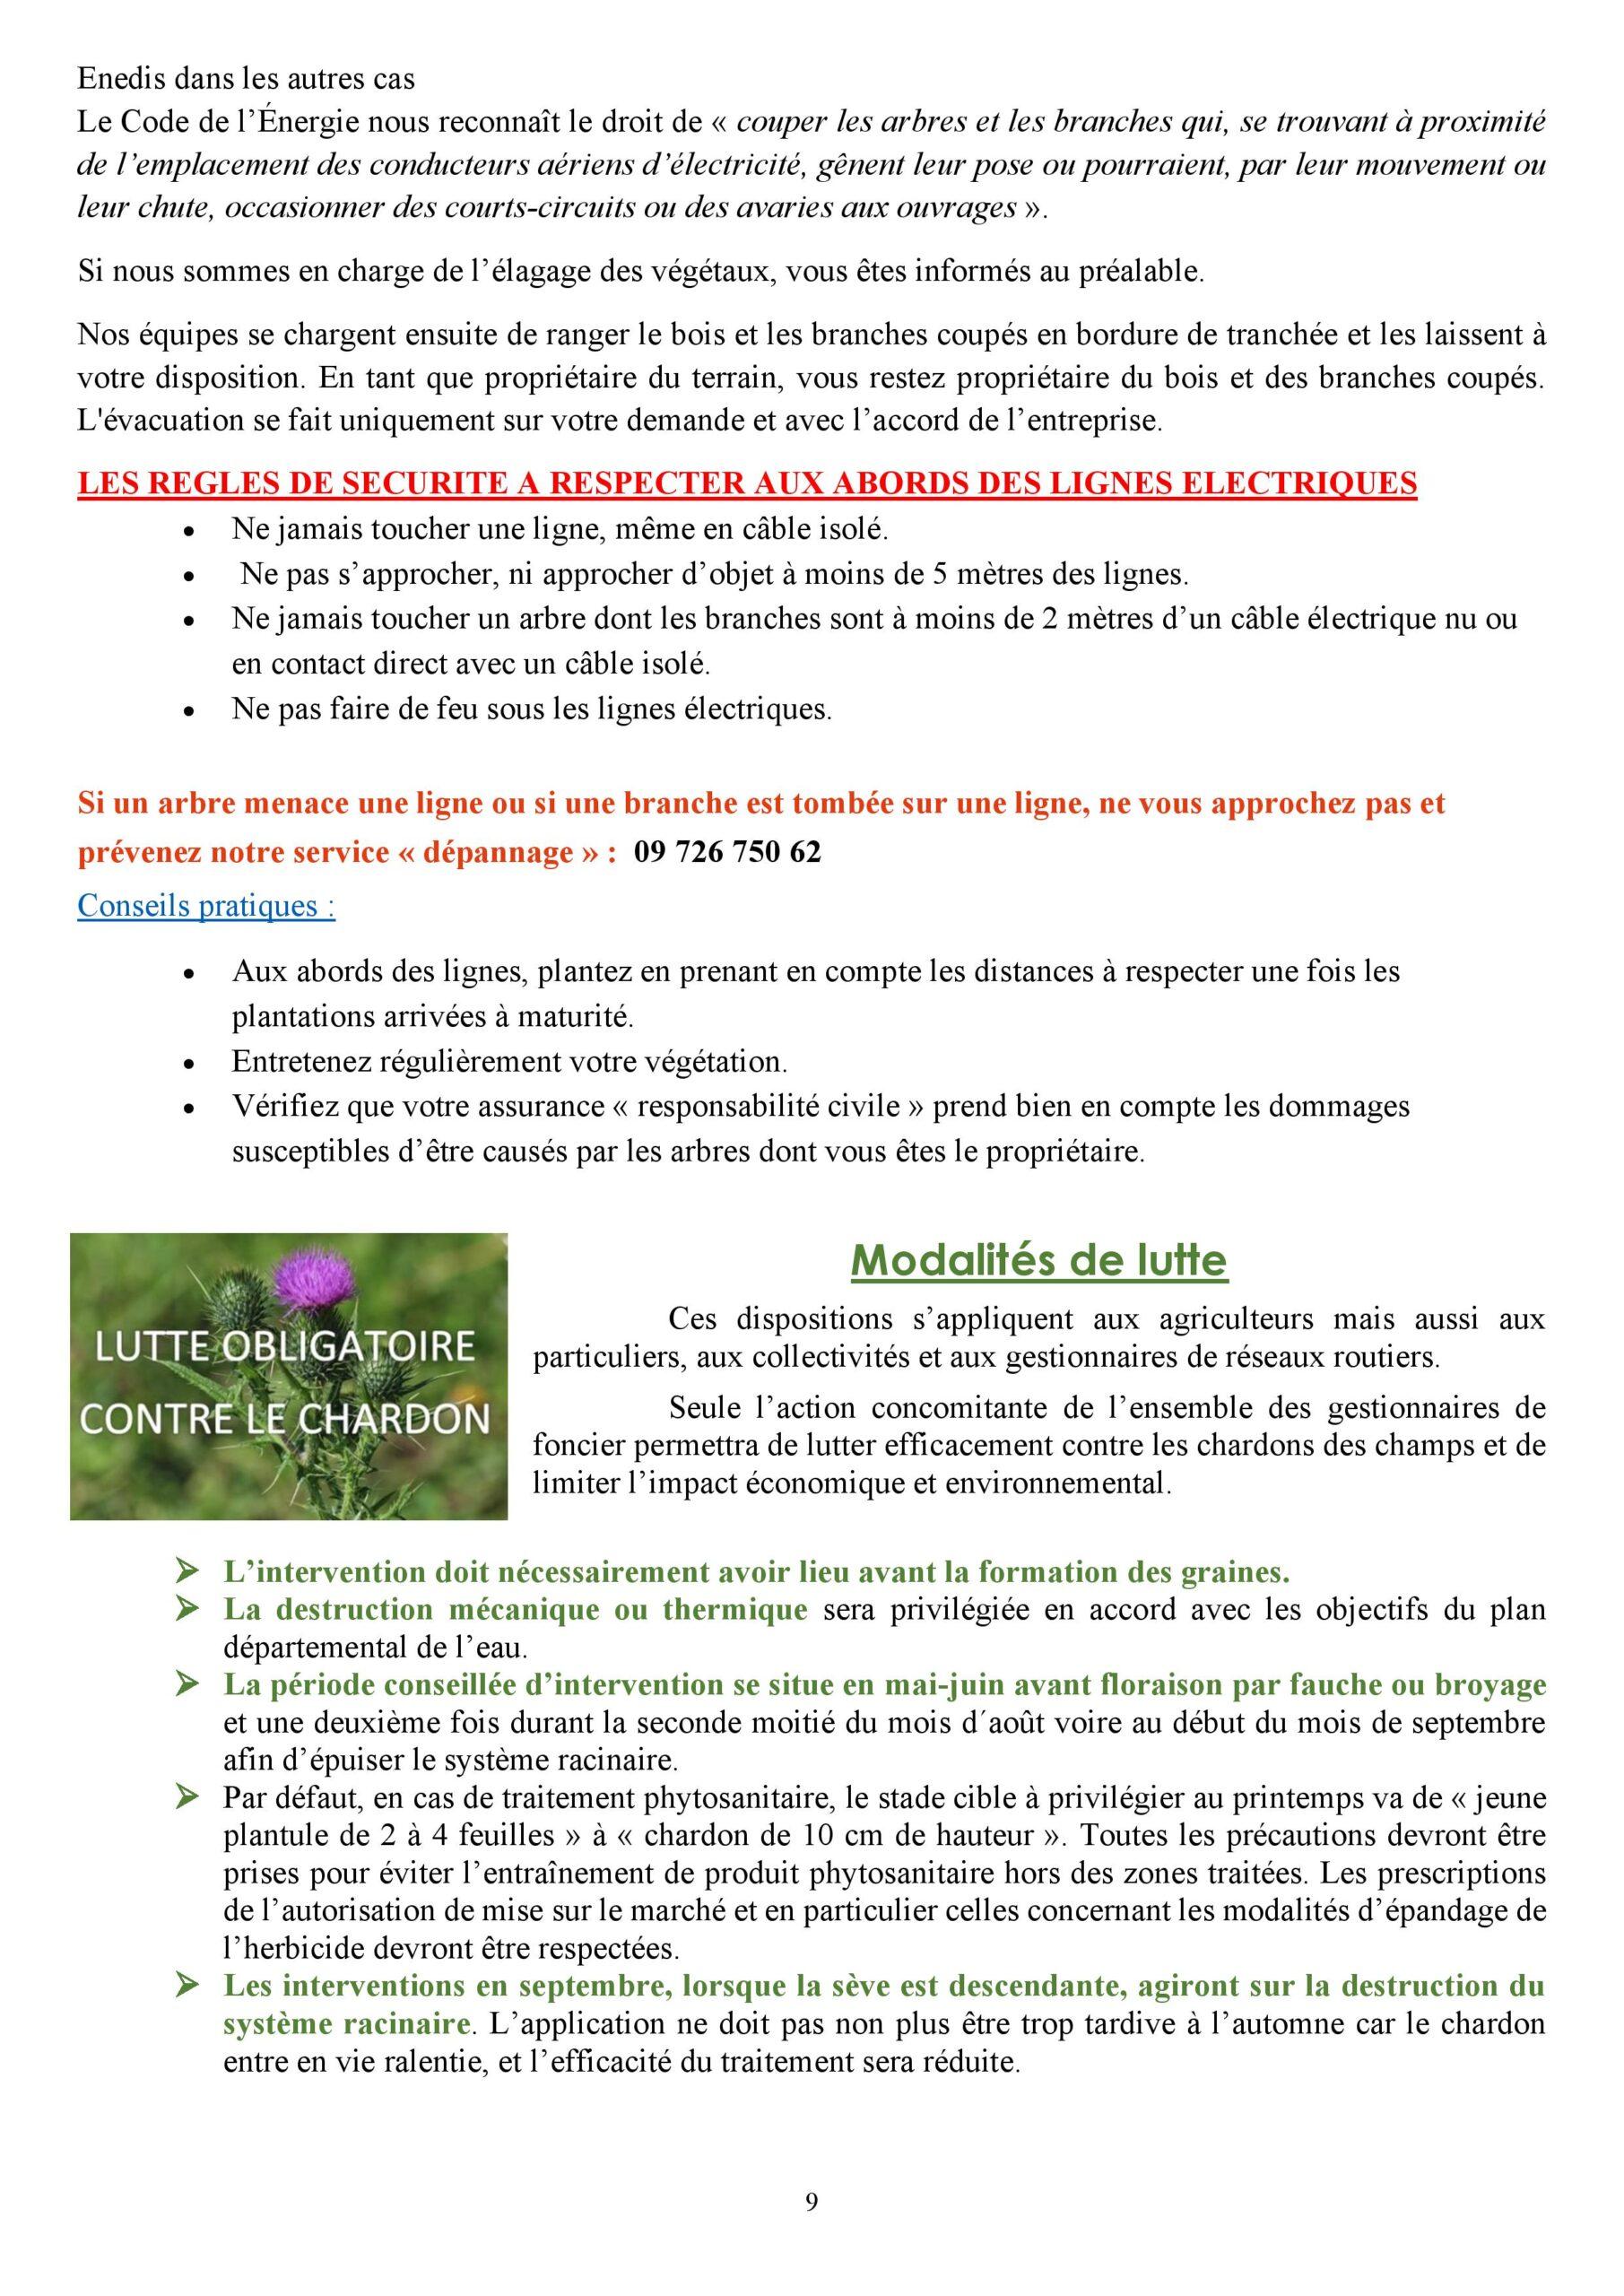 bulletin municipal septembre 2020-page-009_LI